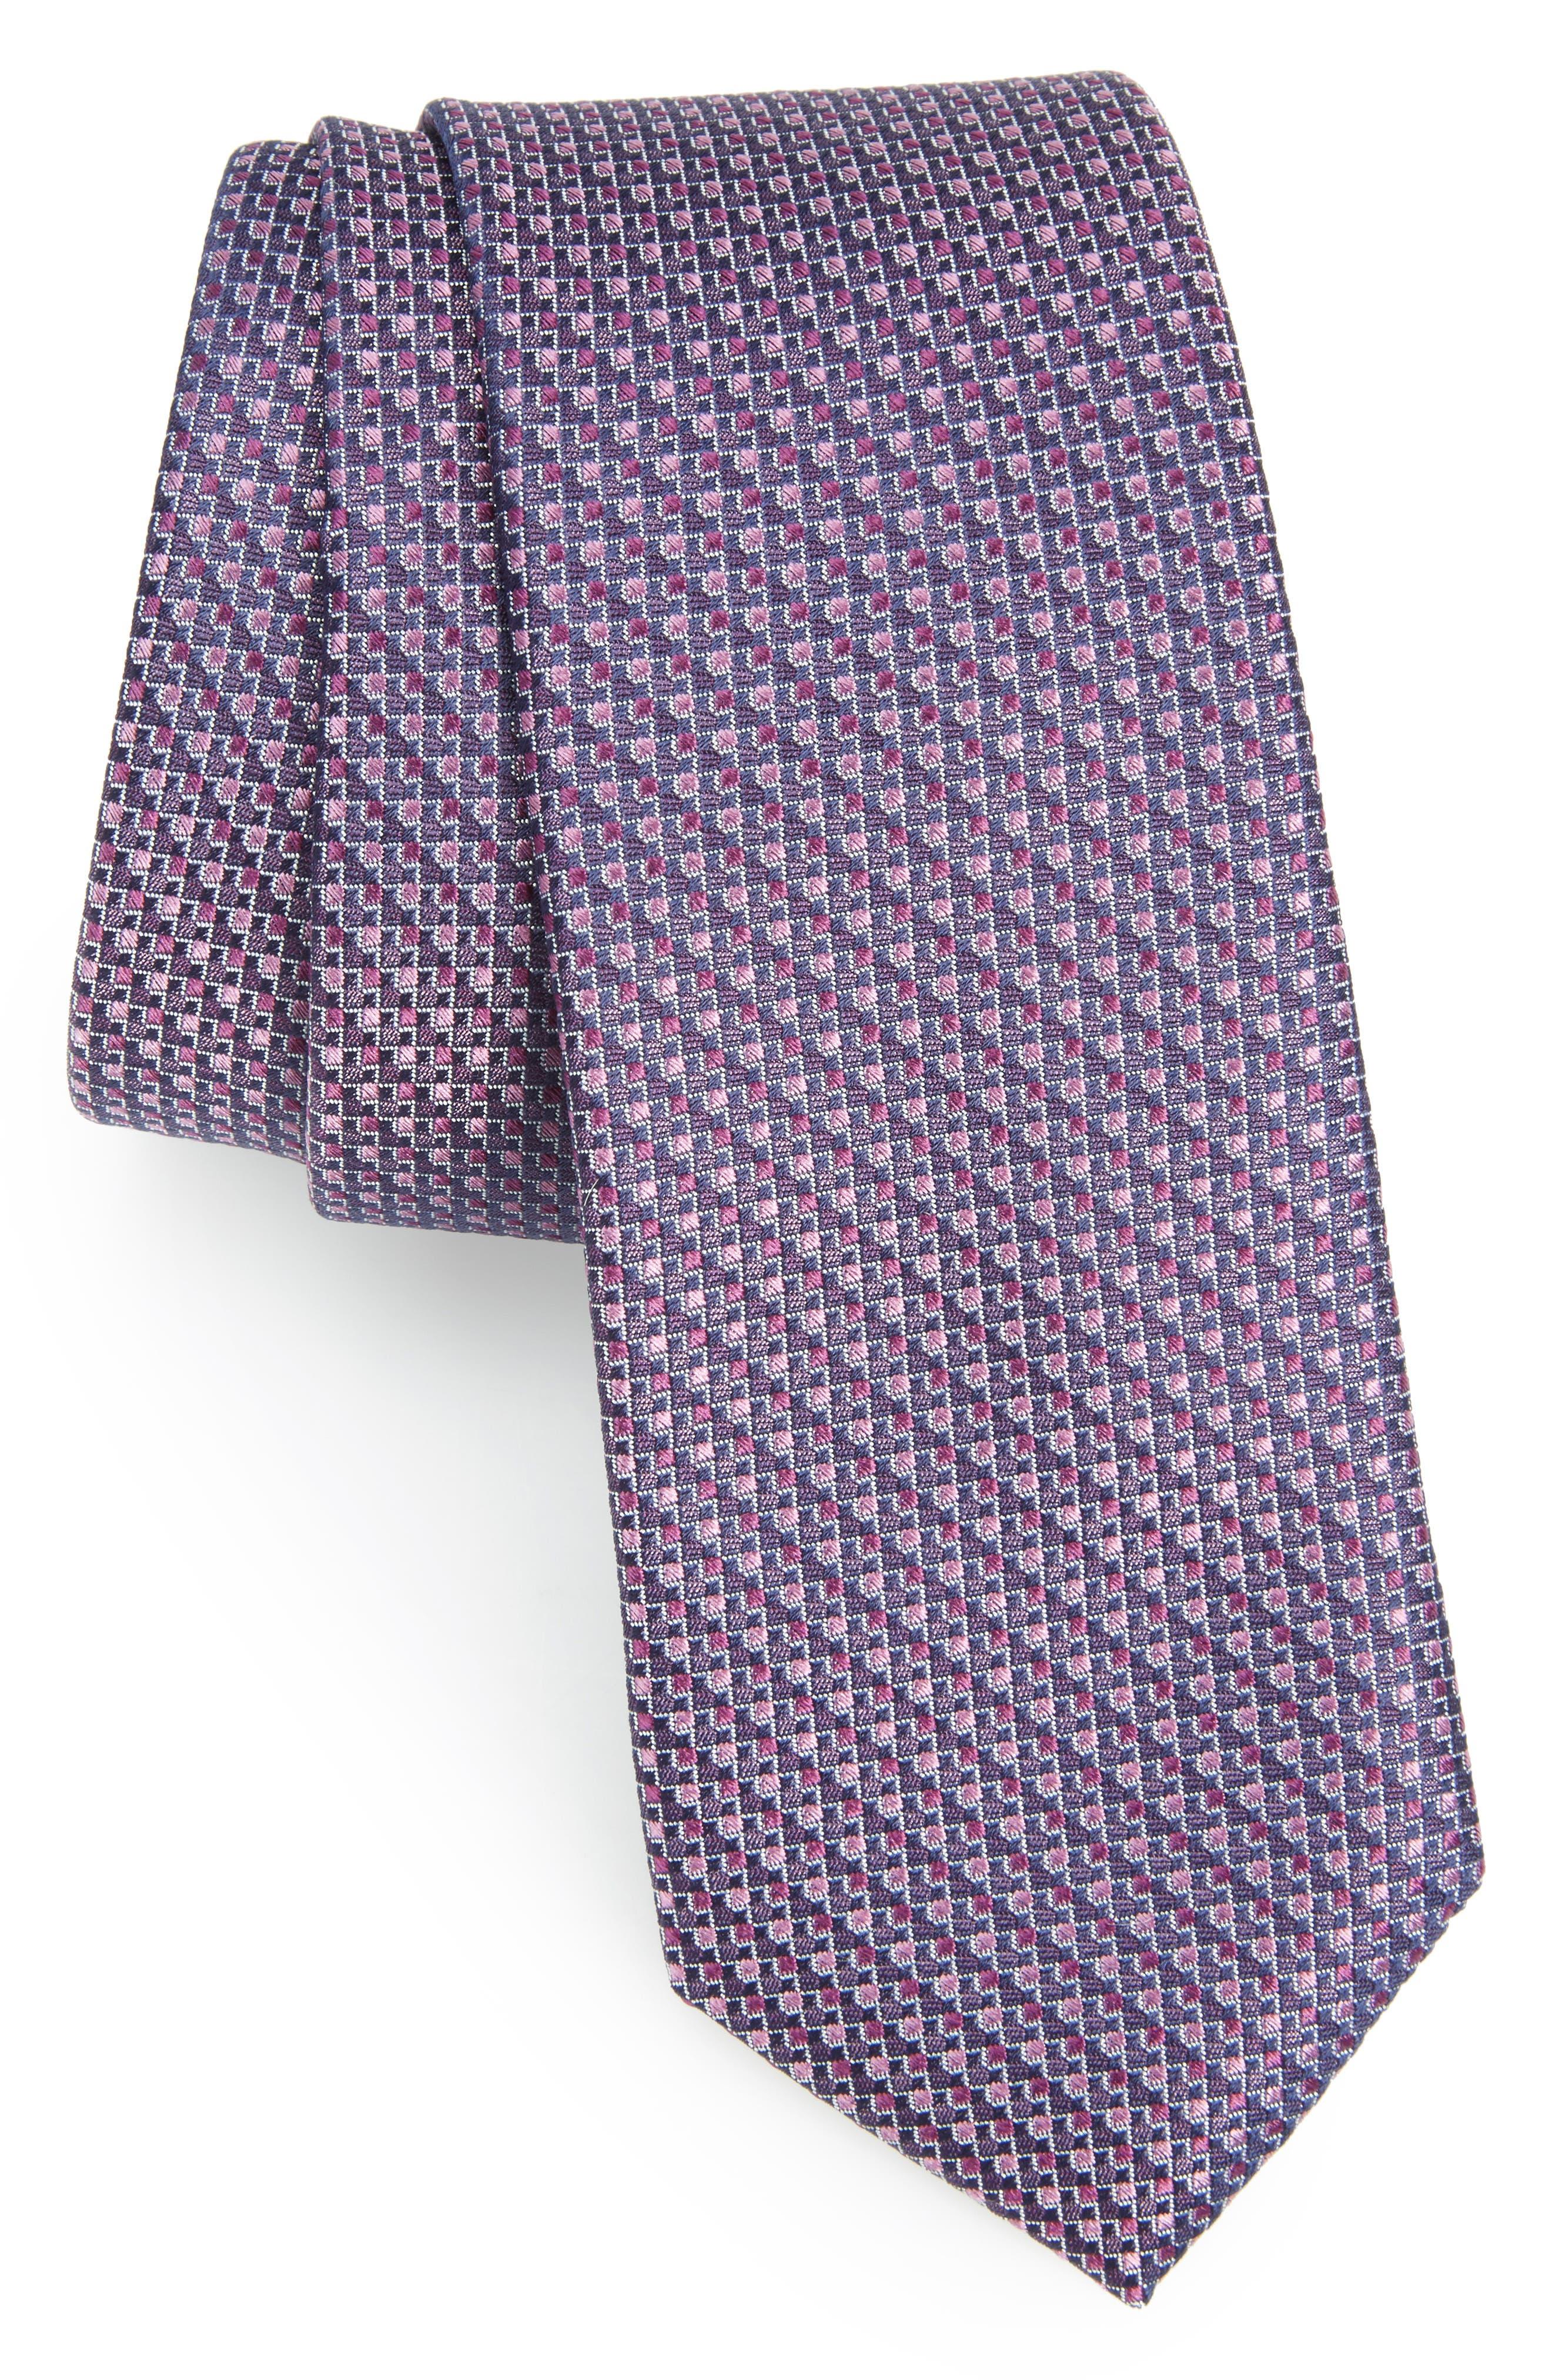 Calibrate Stellar Skinny Silk Tie